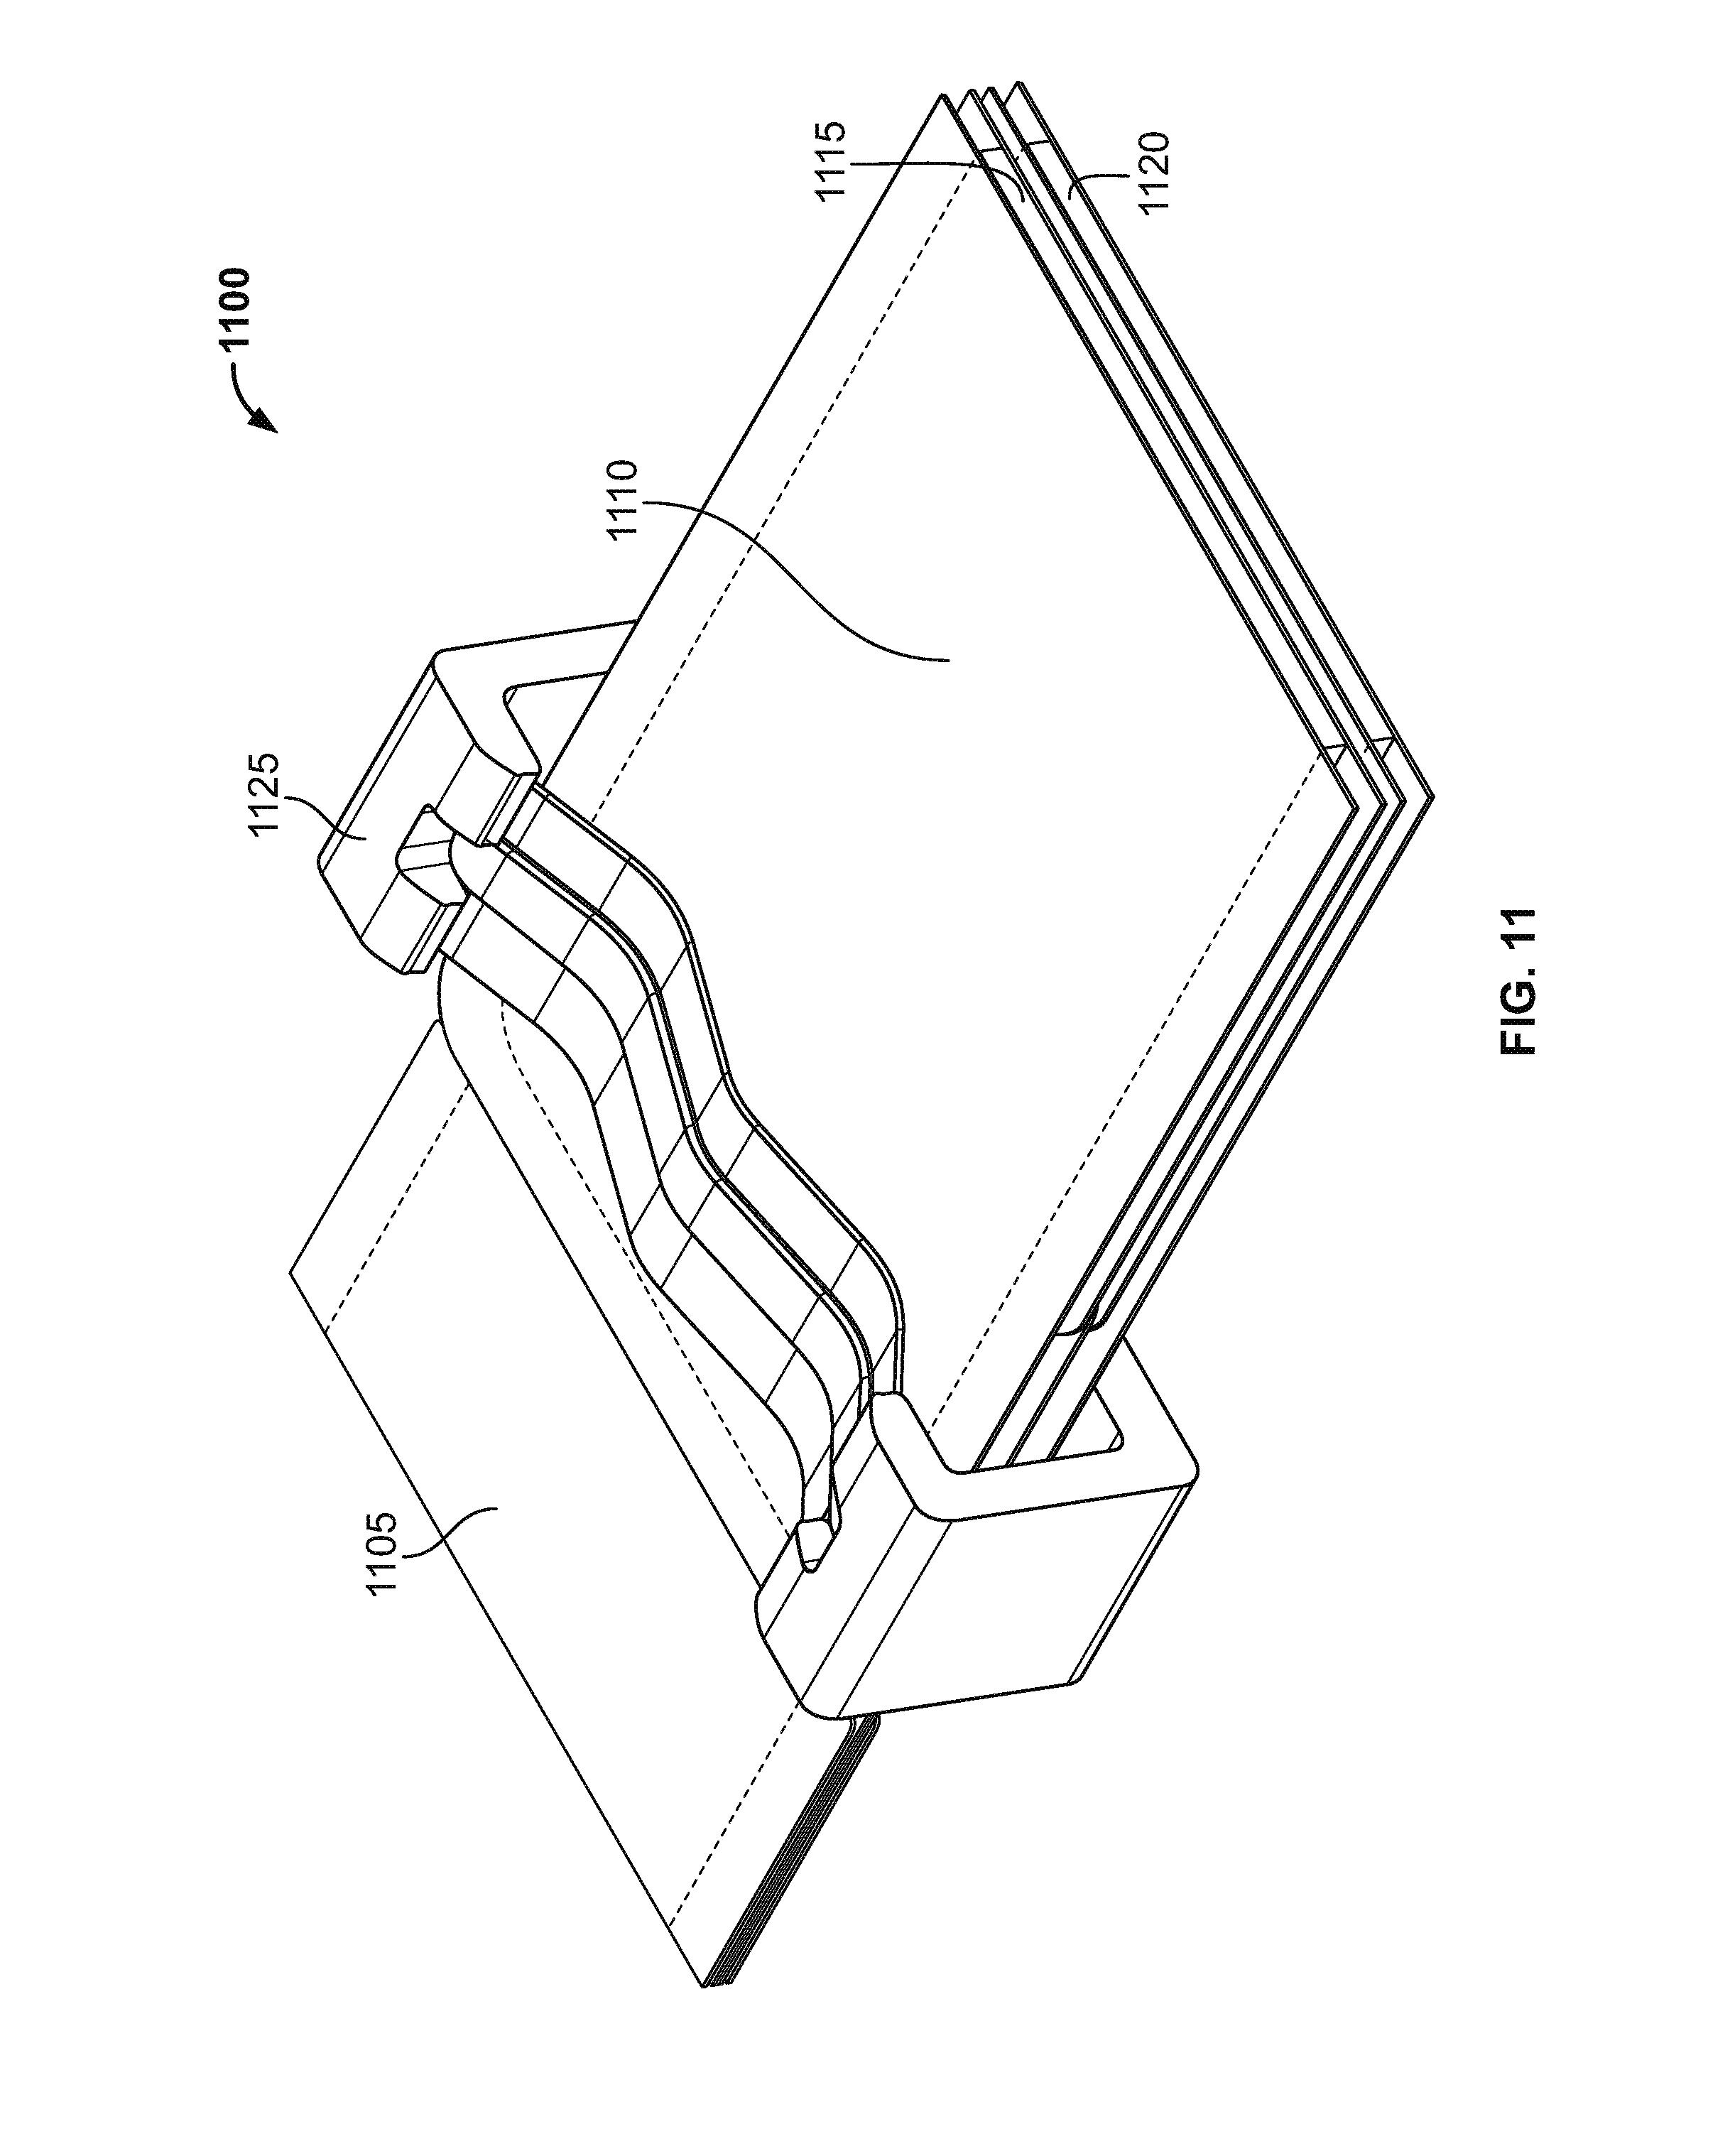 mey ferguson hydraulic diagram mey free engine image for user manual